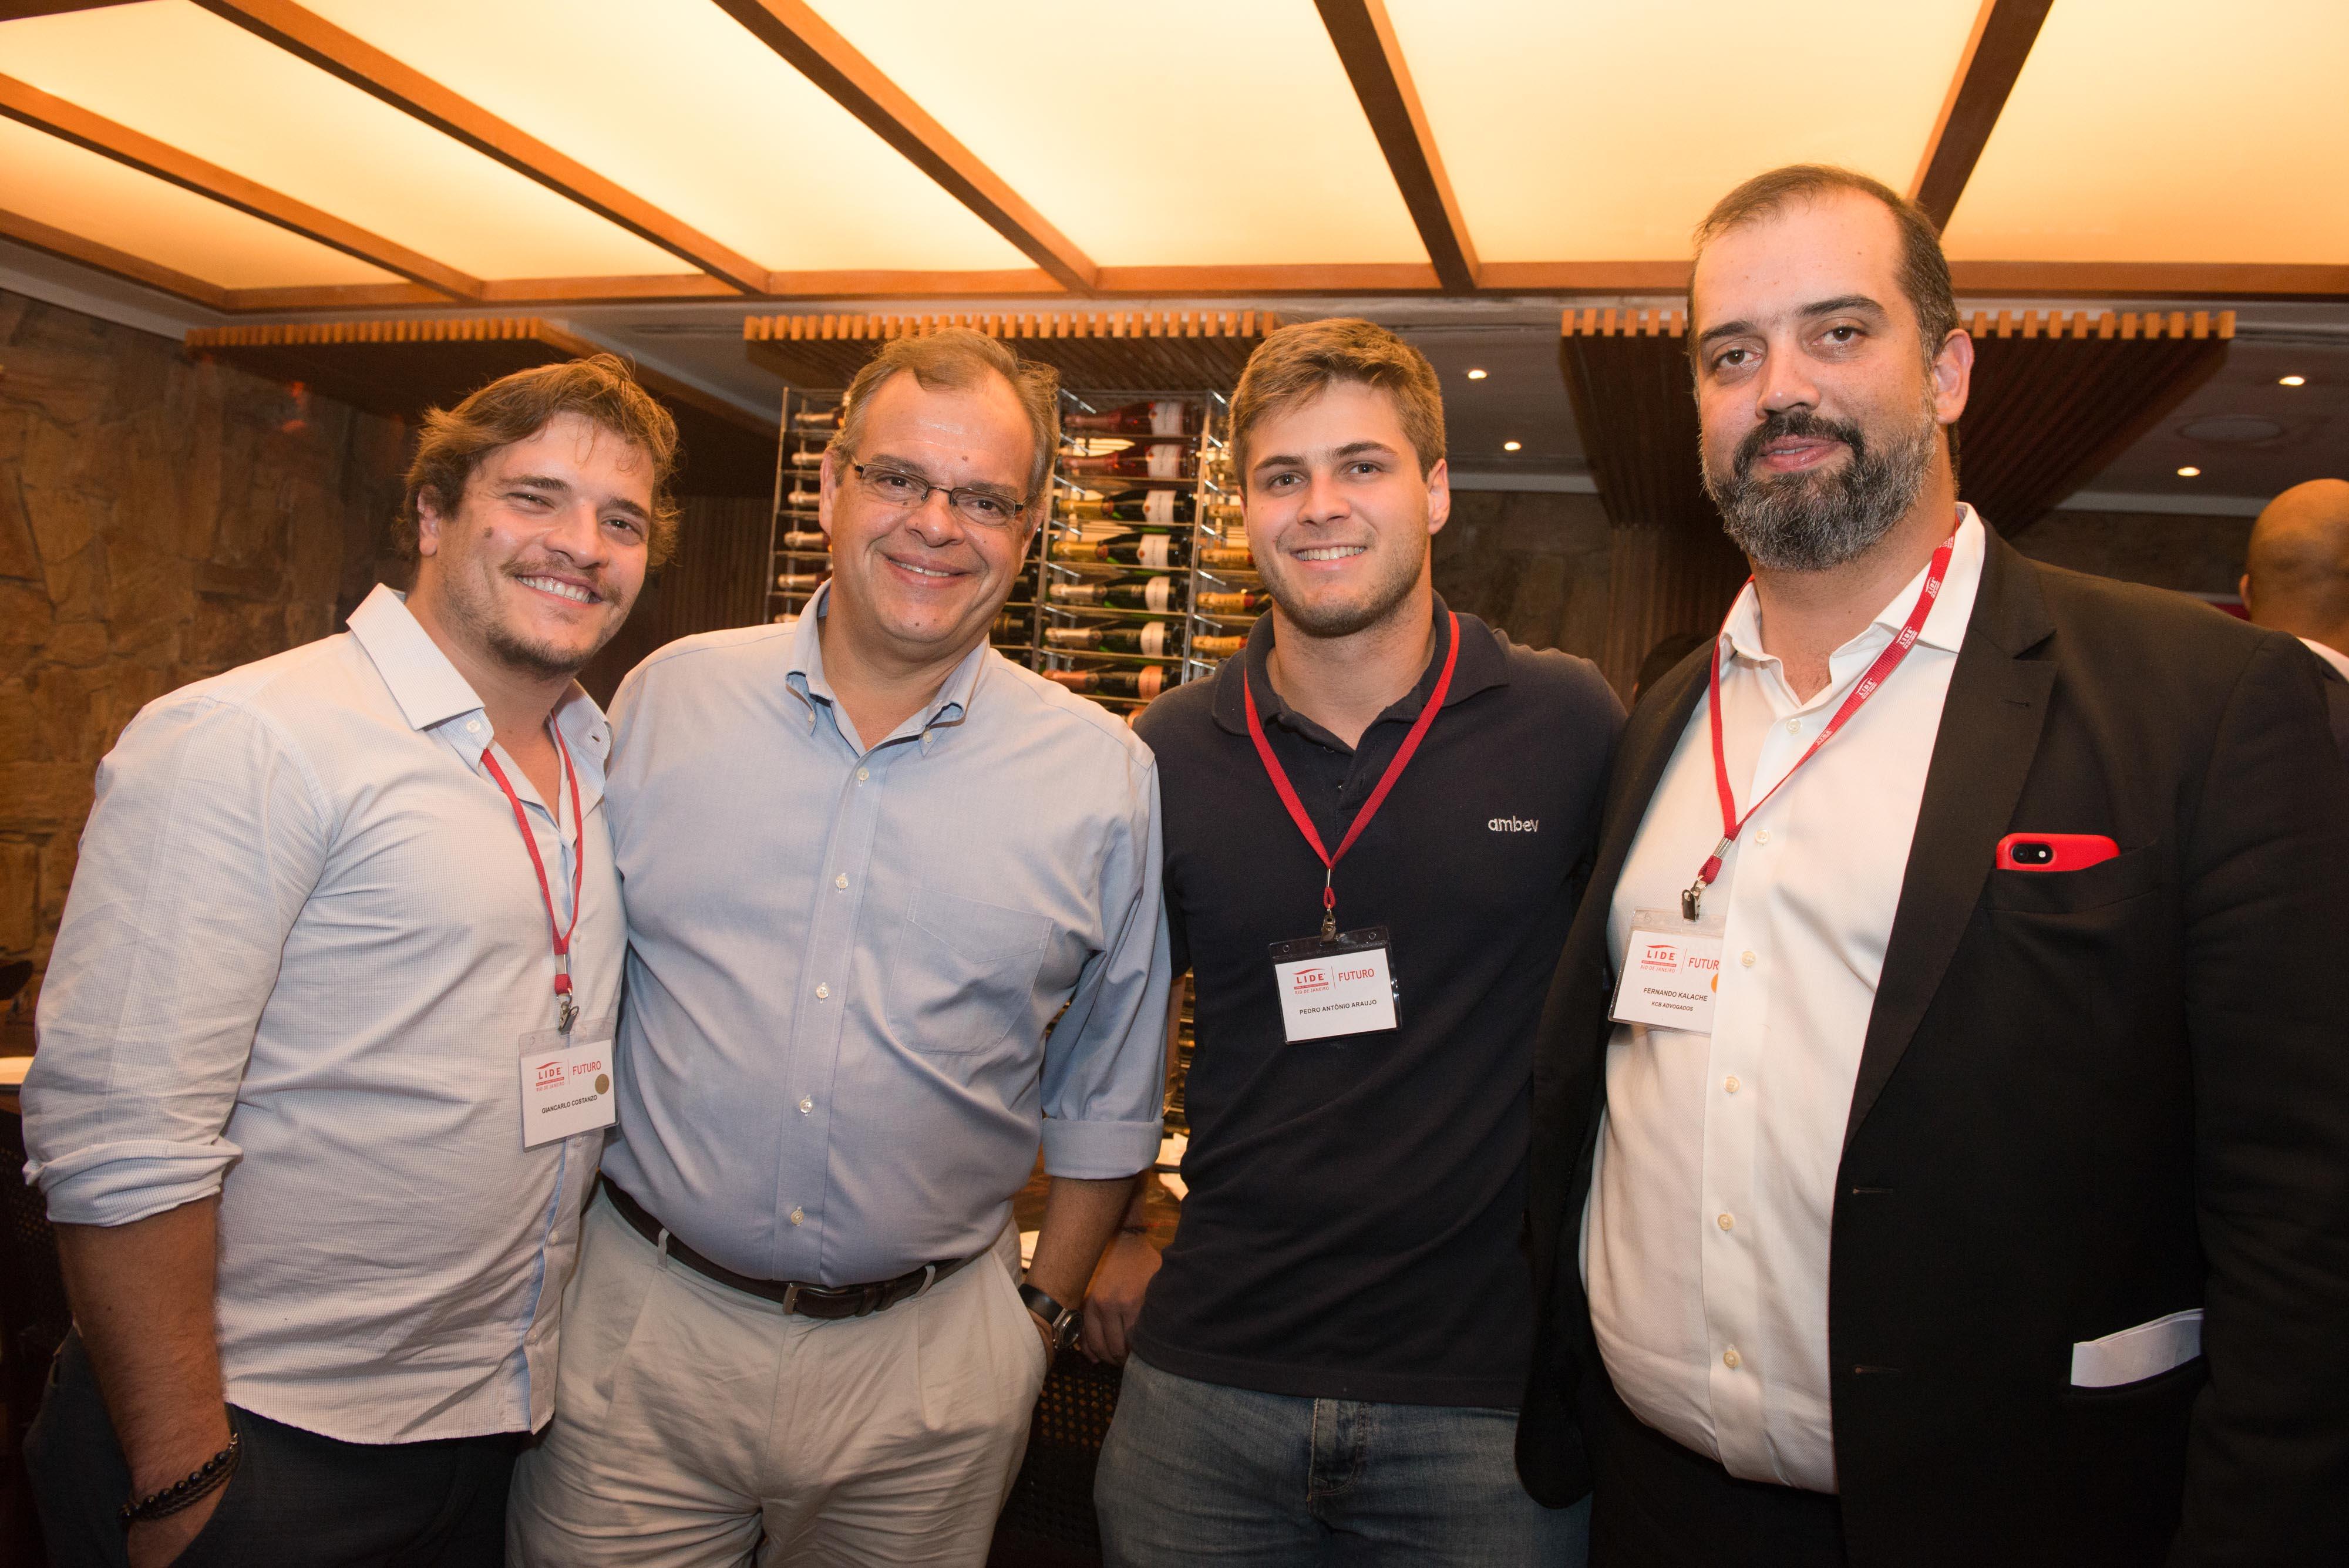 Giancarlo Costanza, Marcelo Torres, Pedro Antonio Araújo, Fernando Kalache